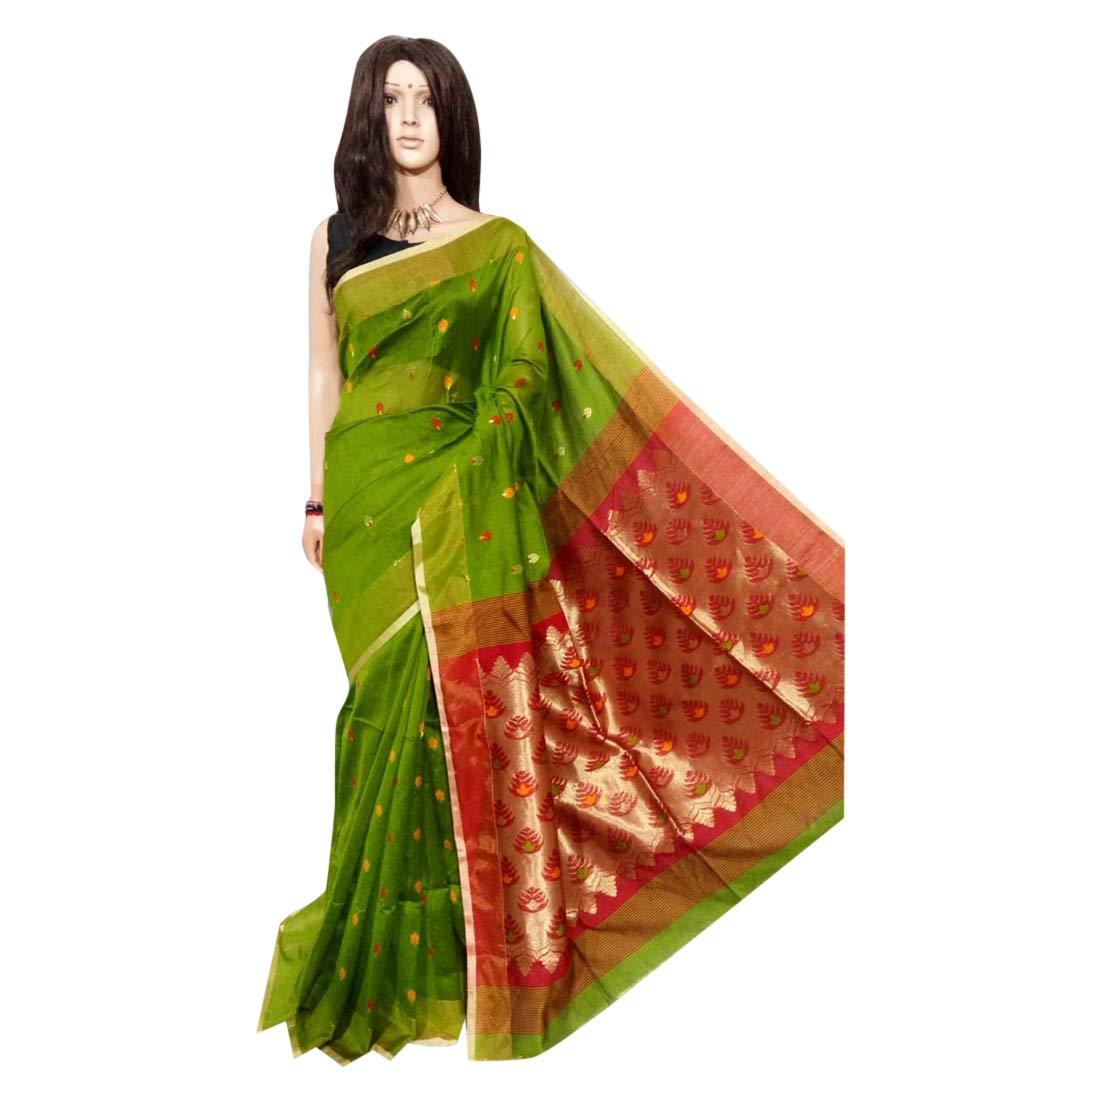 f98ab7e6a4 Amazon.com: Green Handloom Silk Soft Zari Pallu Soft Thread Saree Indian  Sari Blouse Handmade West Bengal Weavers 132a: Home Improvement